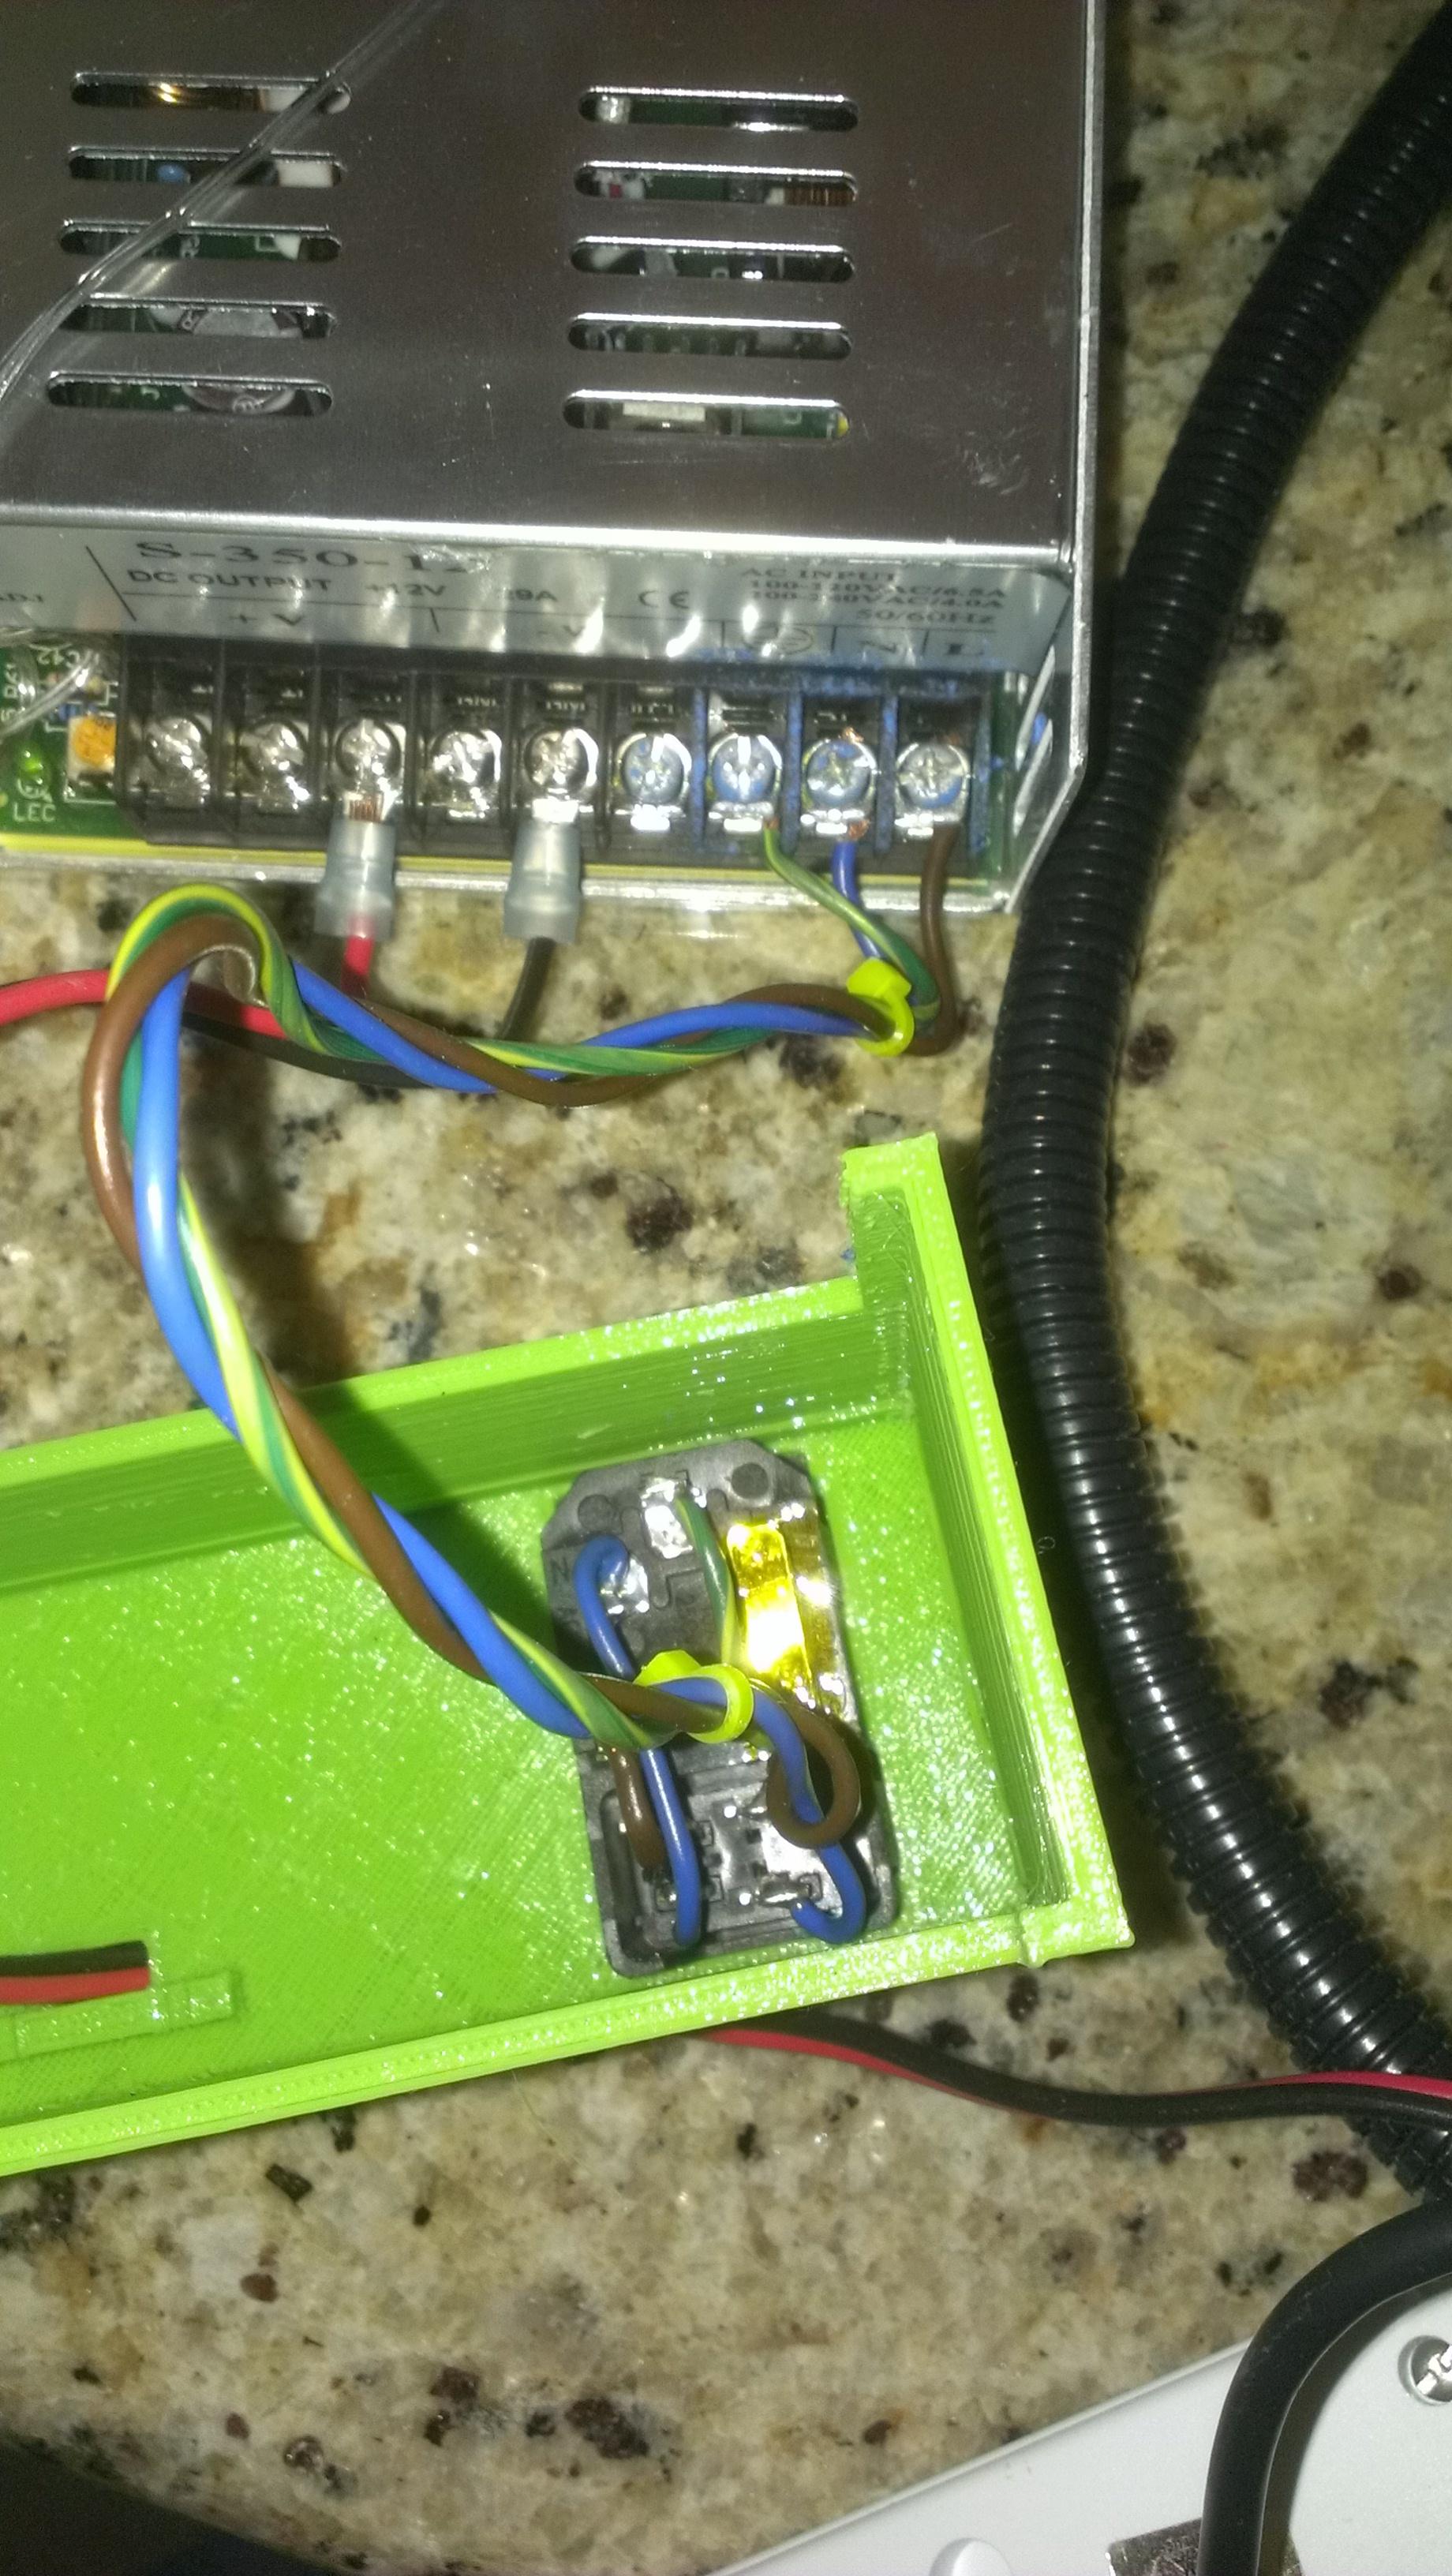 msfwebdude_supply_switch_3?w=400&tok=e1c157 adding a mains power switch [bukobot 3d printer instructions & docs] IEC 320 C14 Power Plug at creativeand.co